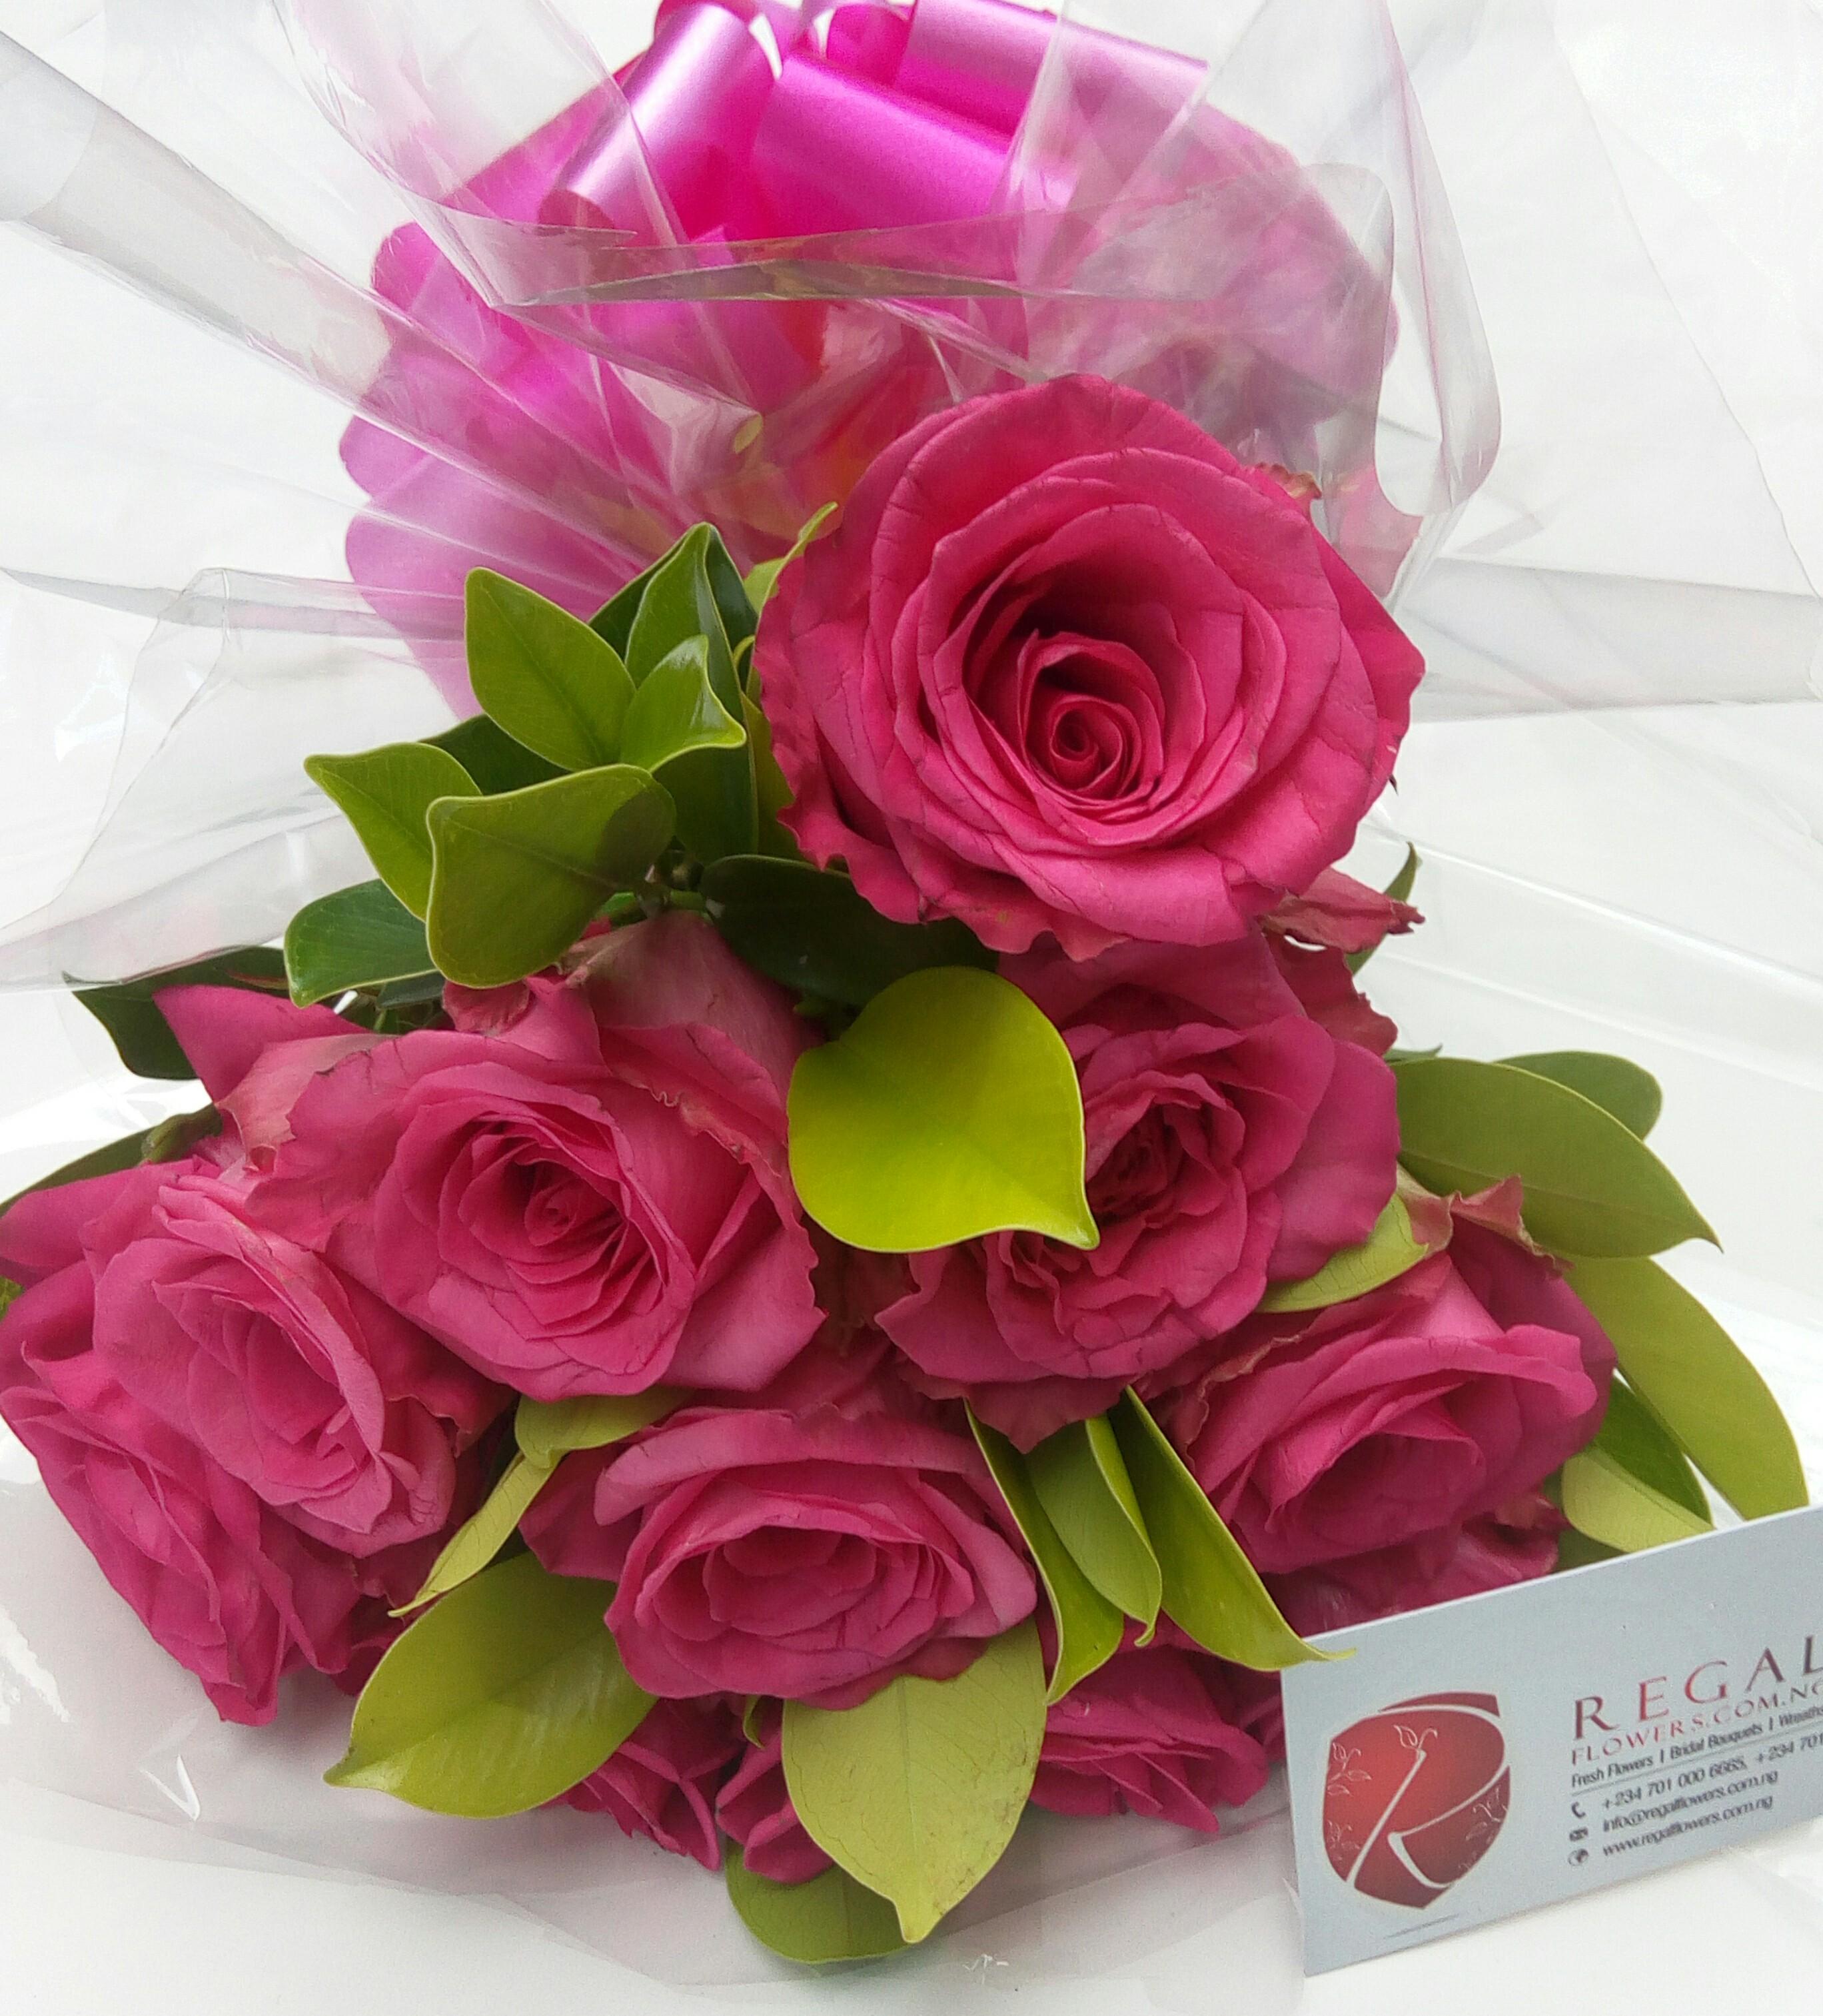 Elegant mix of Fresh cut pink Roses regal flowers